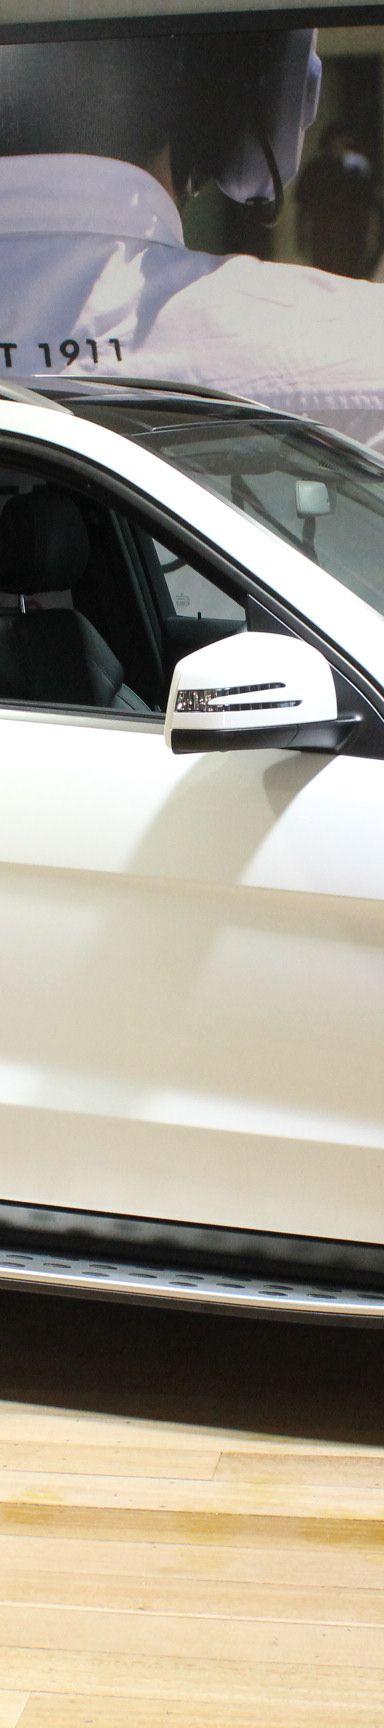 2013 Mercedes-Benz ML350 W166 BlueTEC Wagon - for sale in Australia